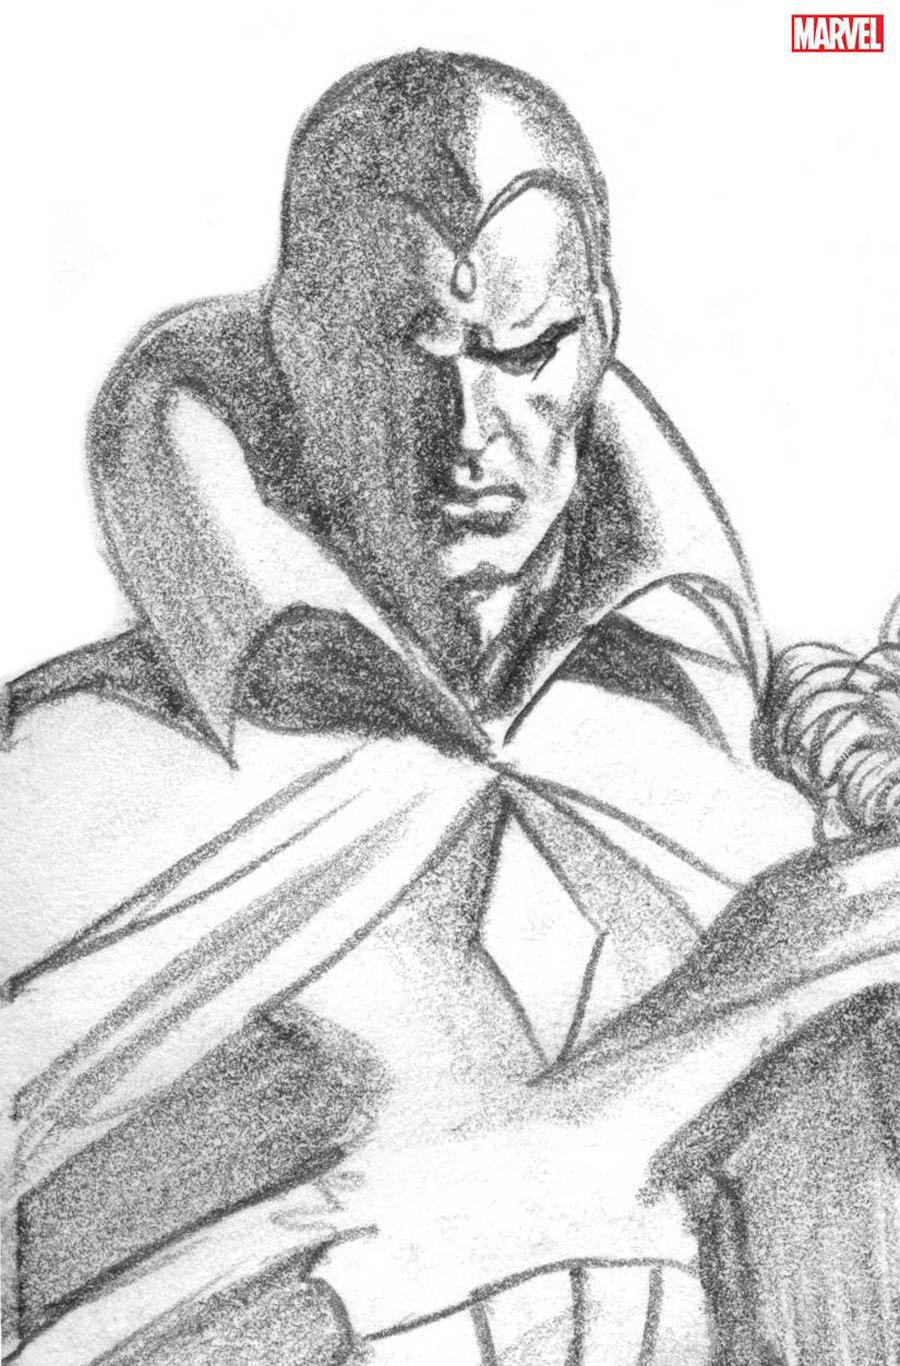 Avengers Vol 7 #43 Cover G Incentive Alex Ross Timeless Sketch Cover